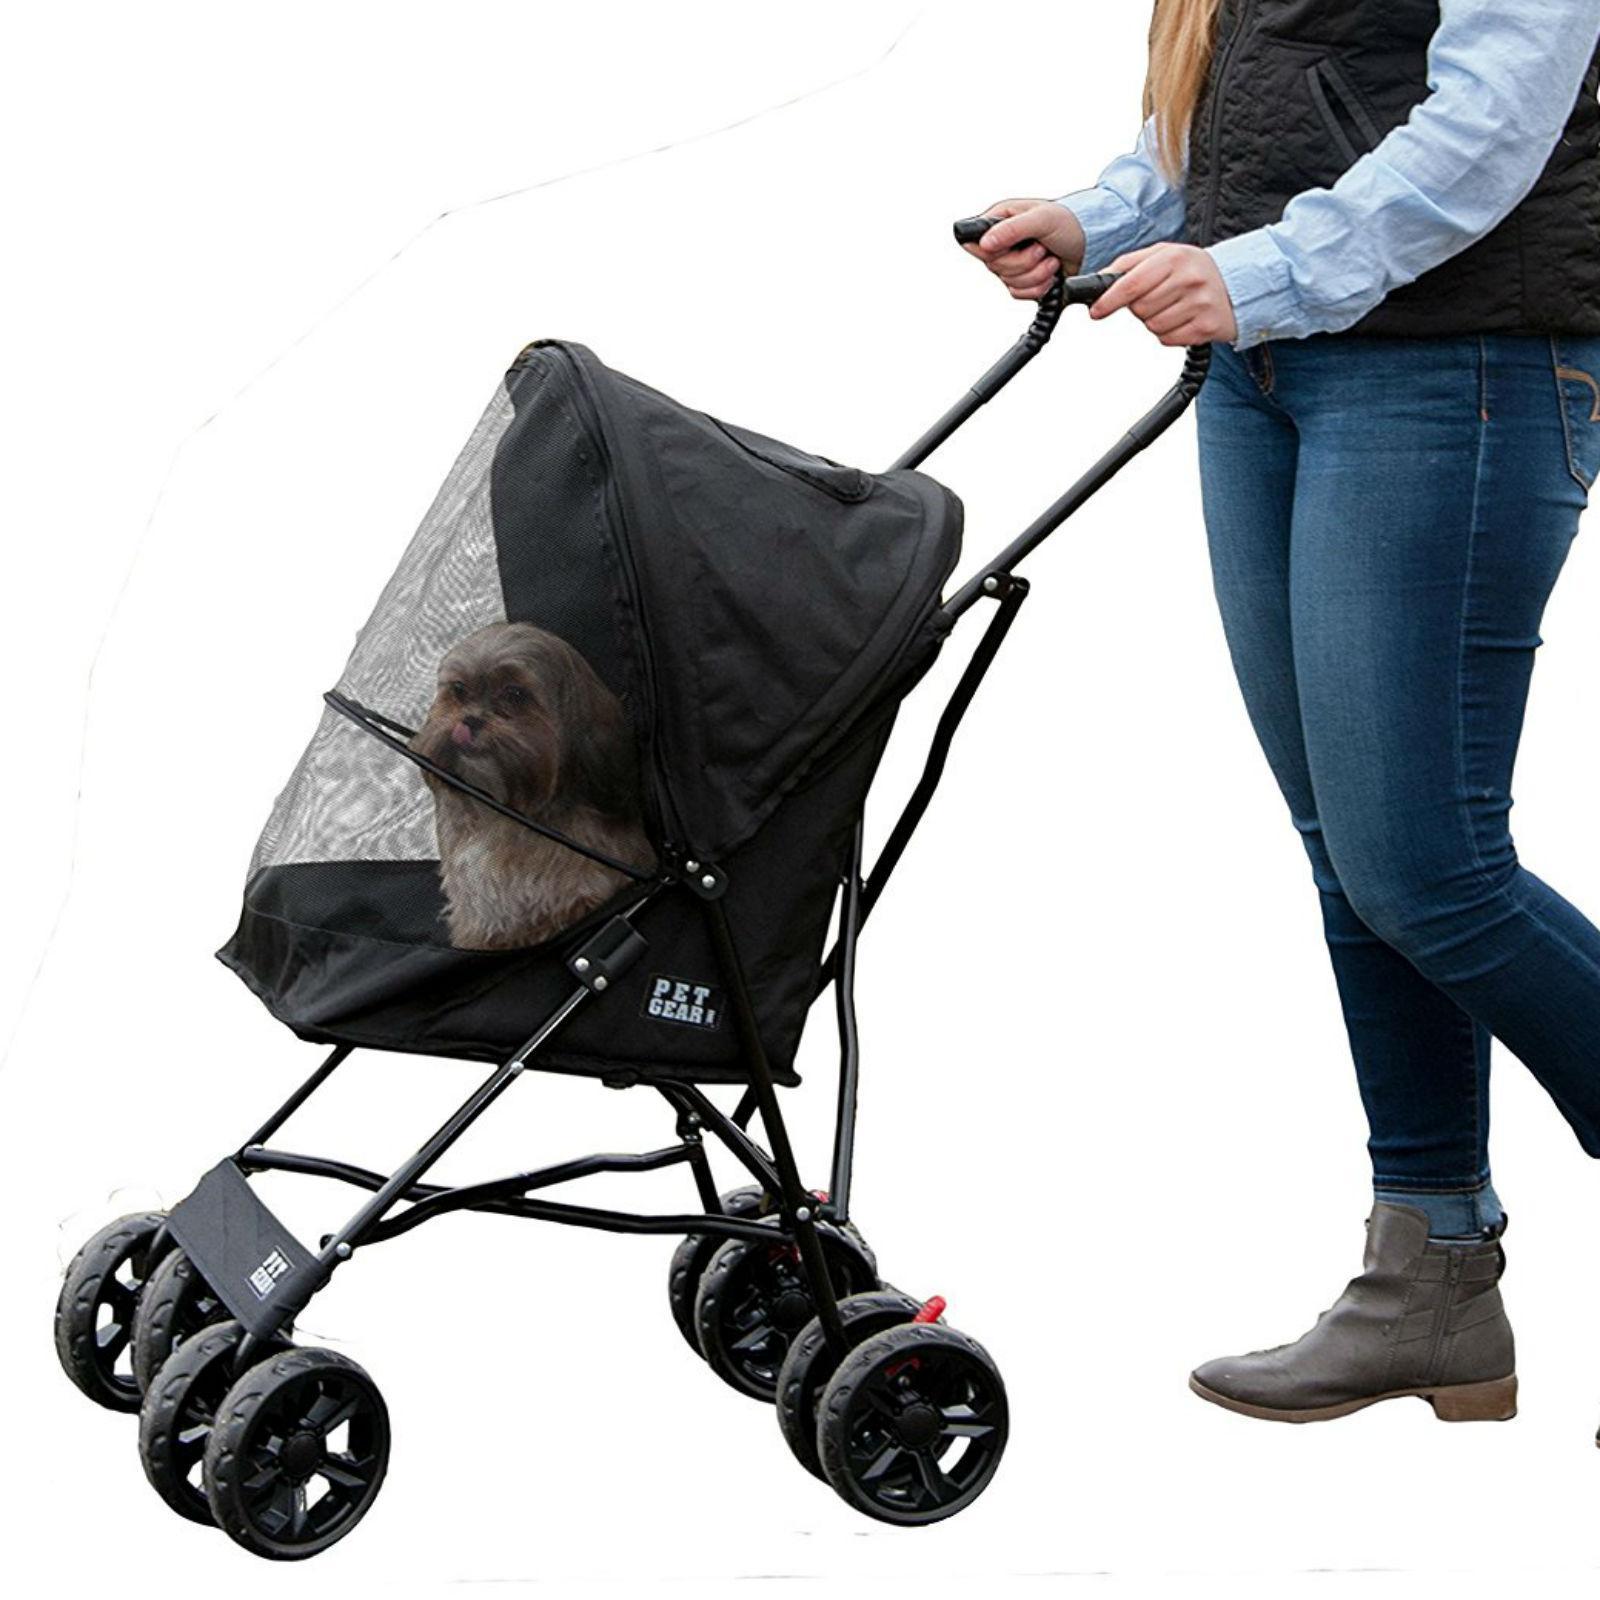 Pet Gear Travel Lite Pet Stroller - Black